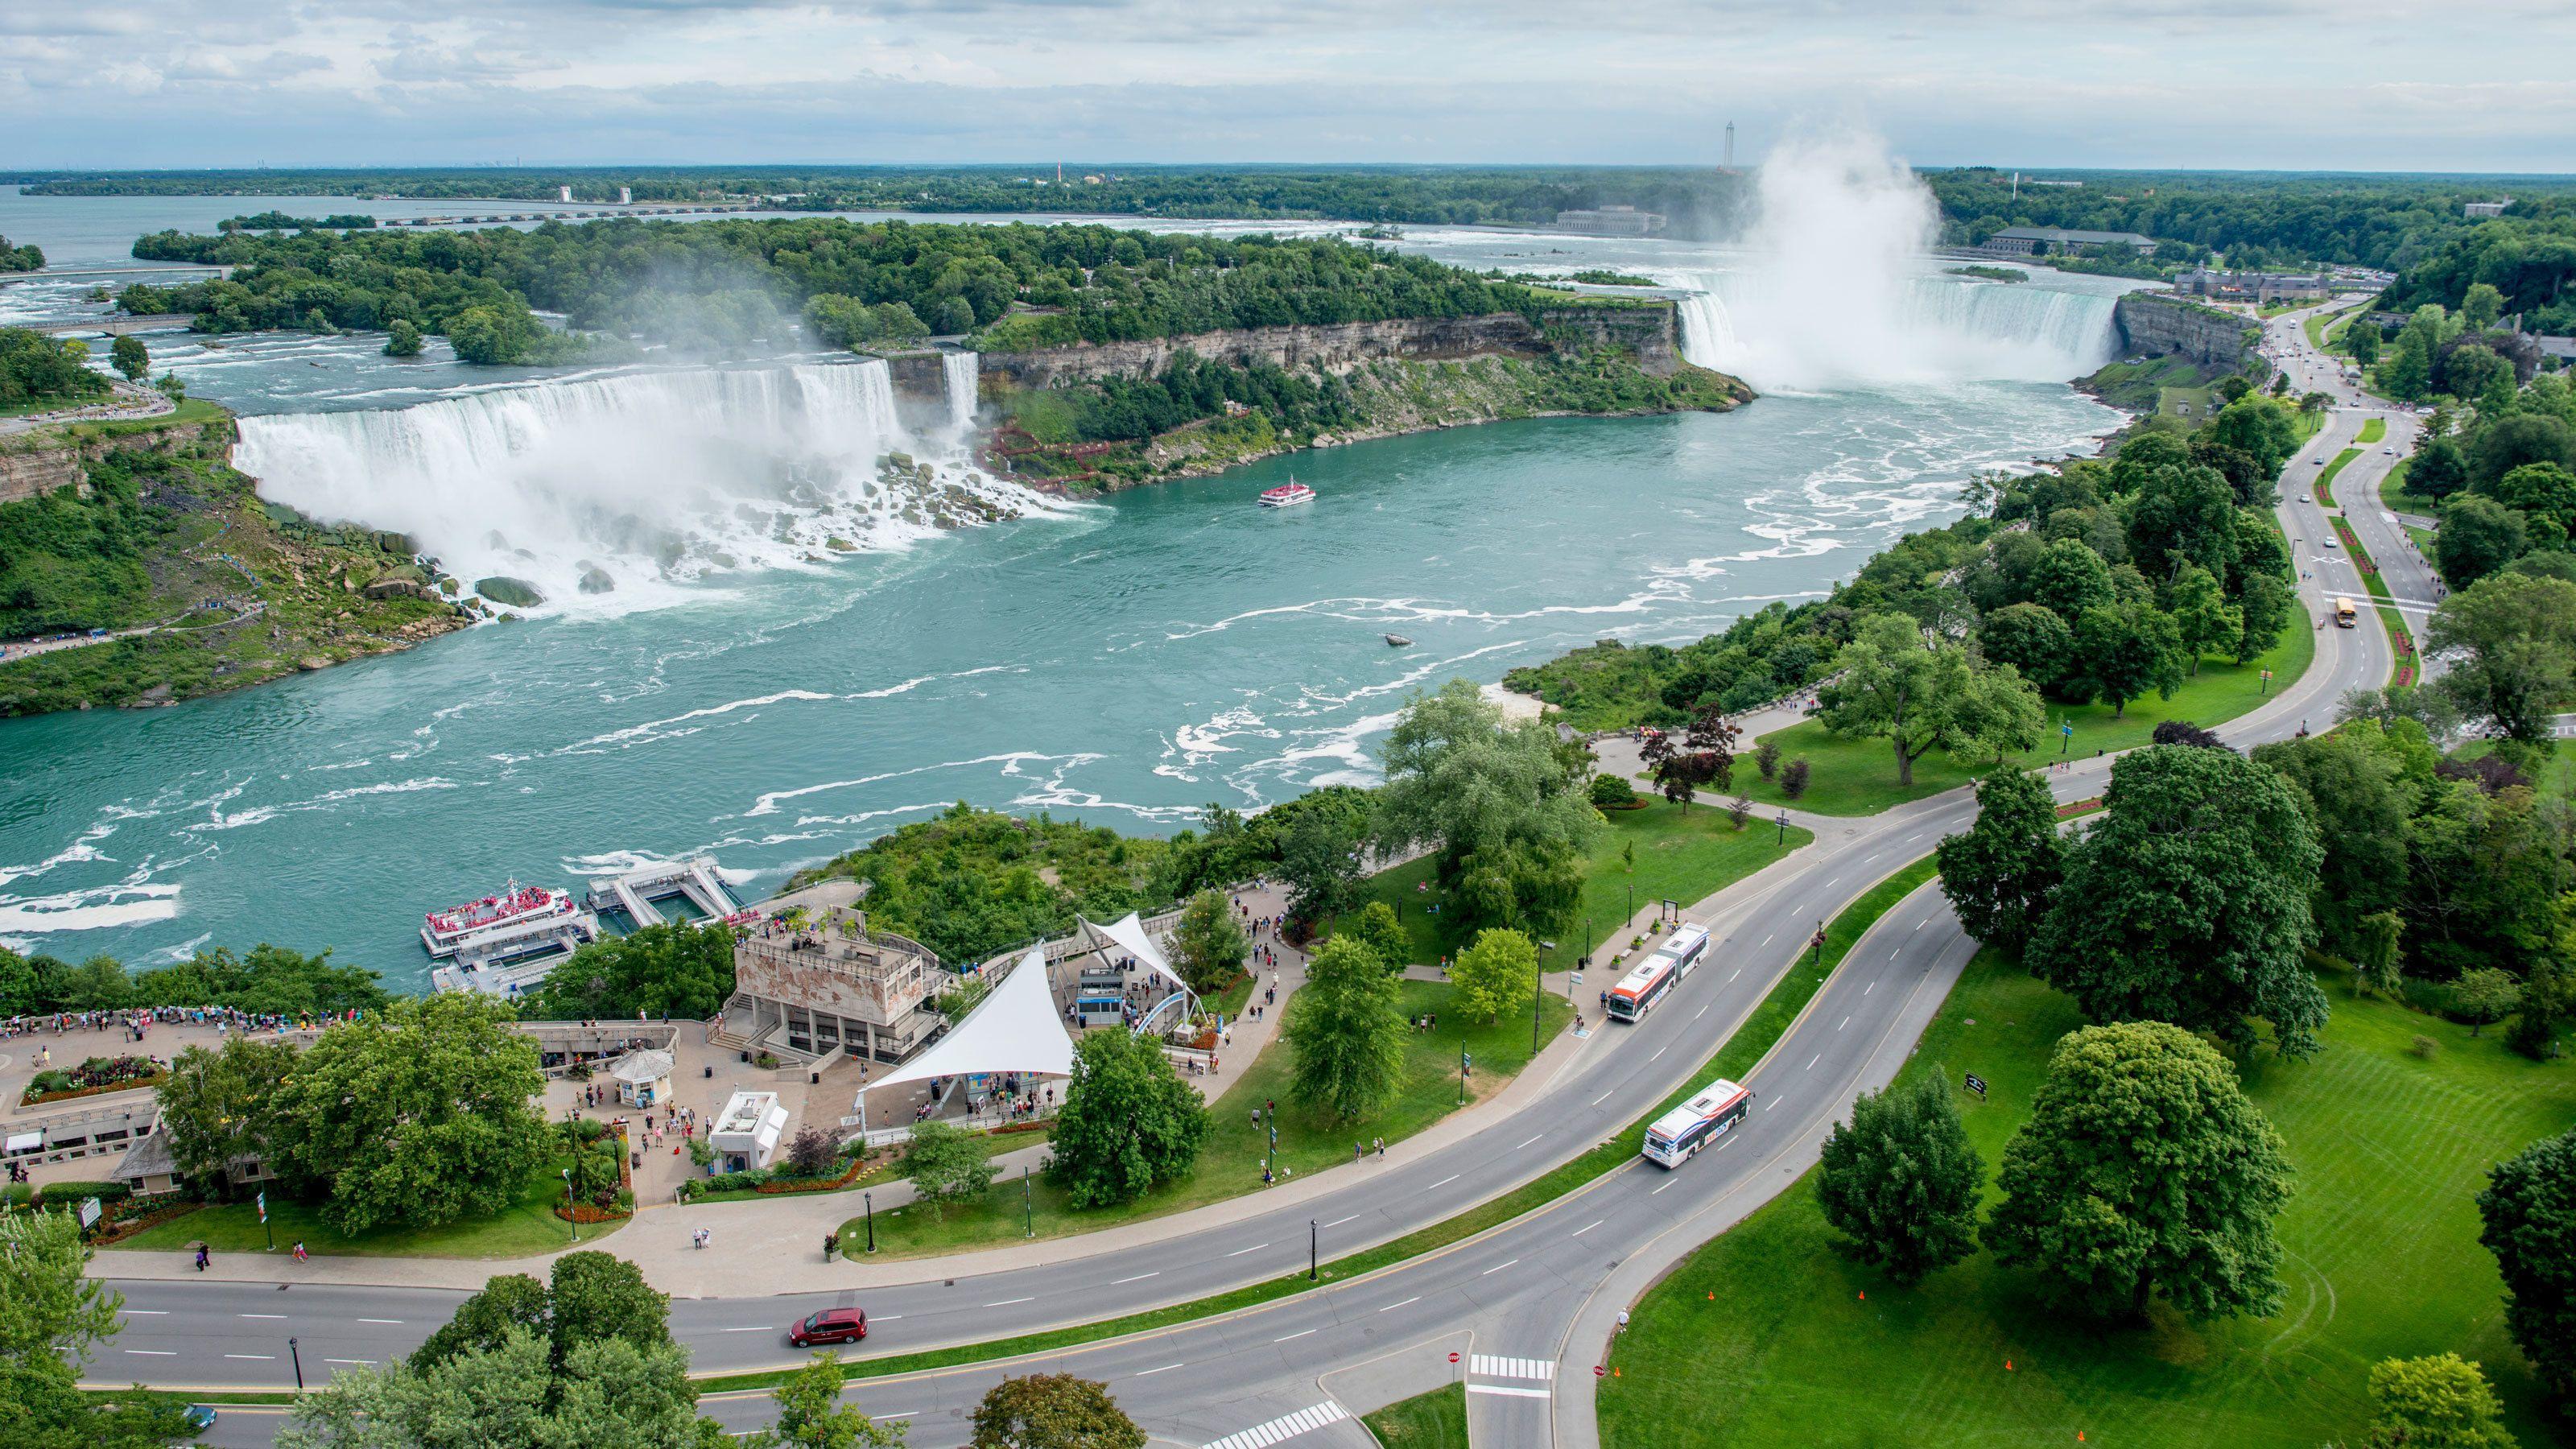 Establishments around the waterfall at Niagara Falls